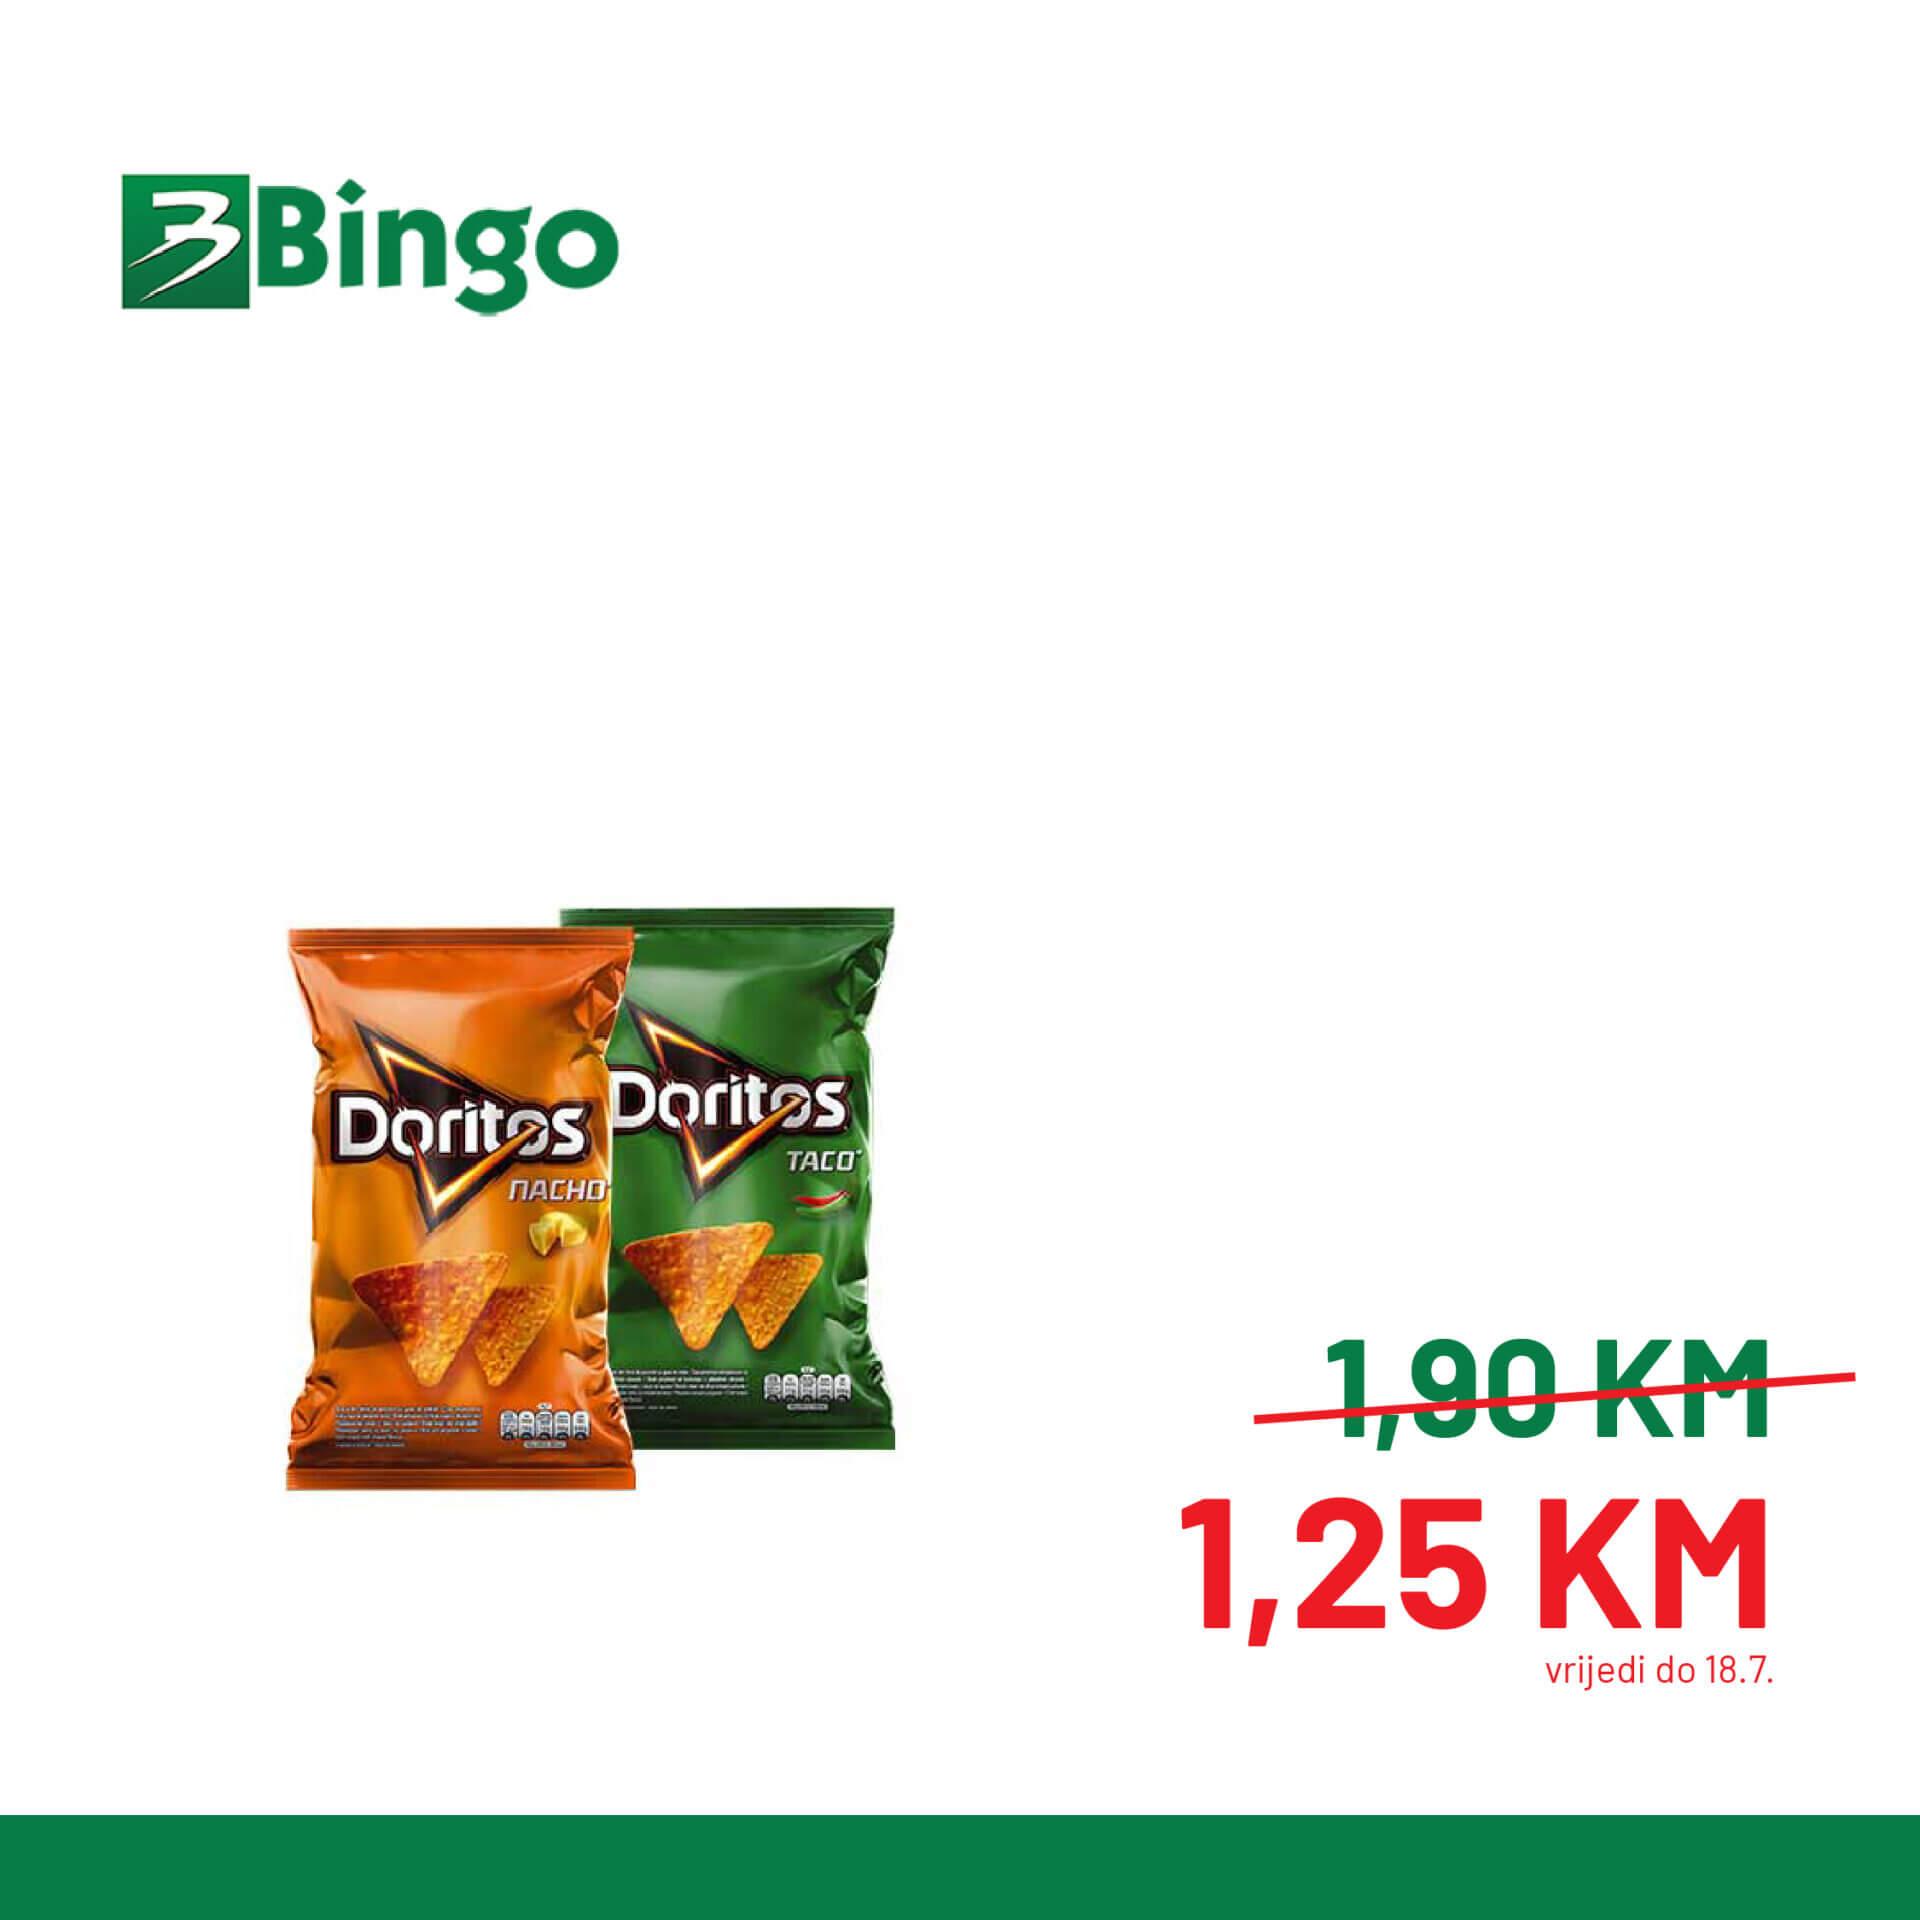 BINGO Katalog Super BINGO Ponude JUL 2021 10.7.2021. 18.7 2